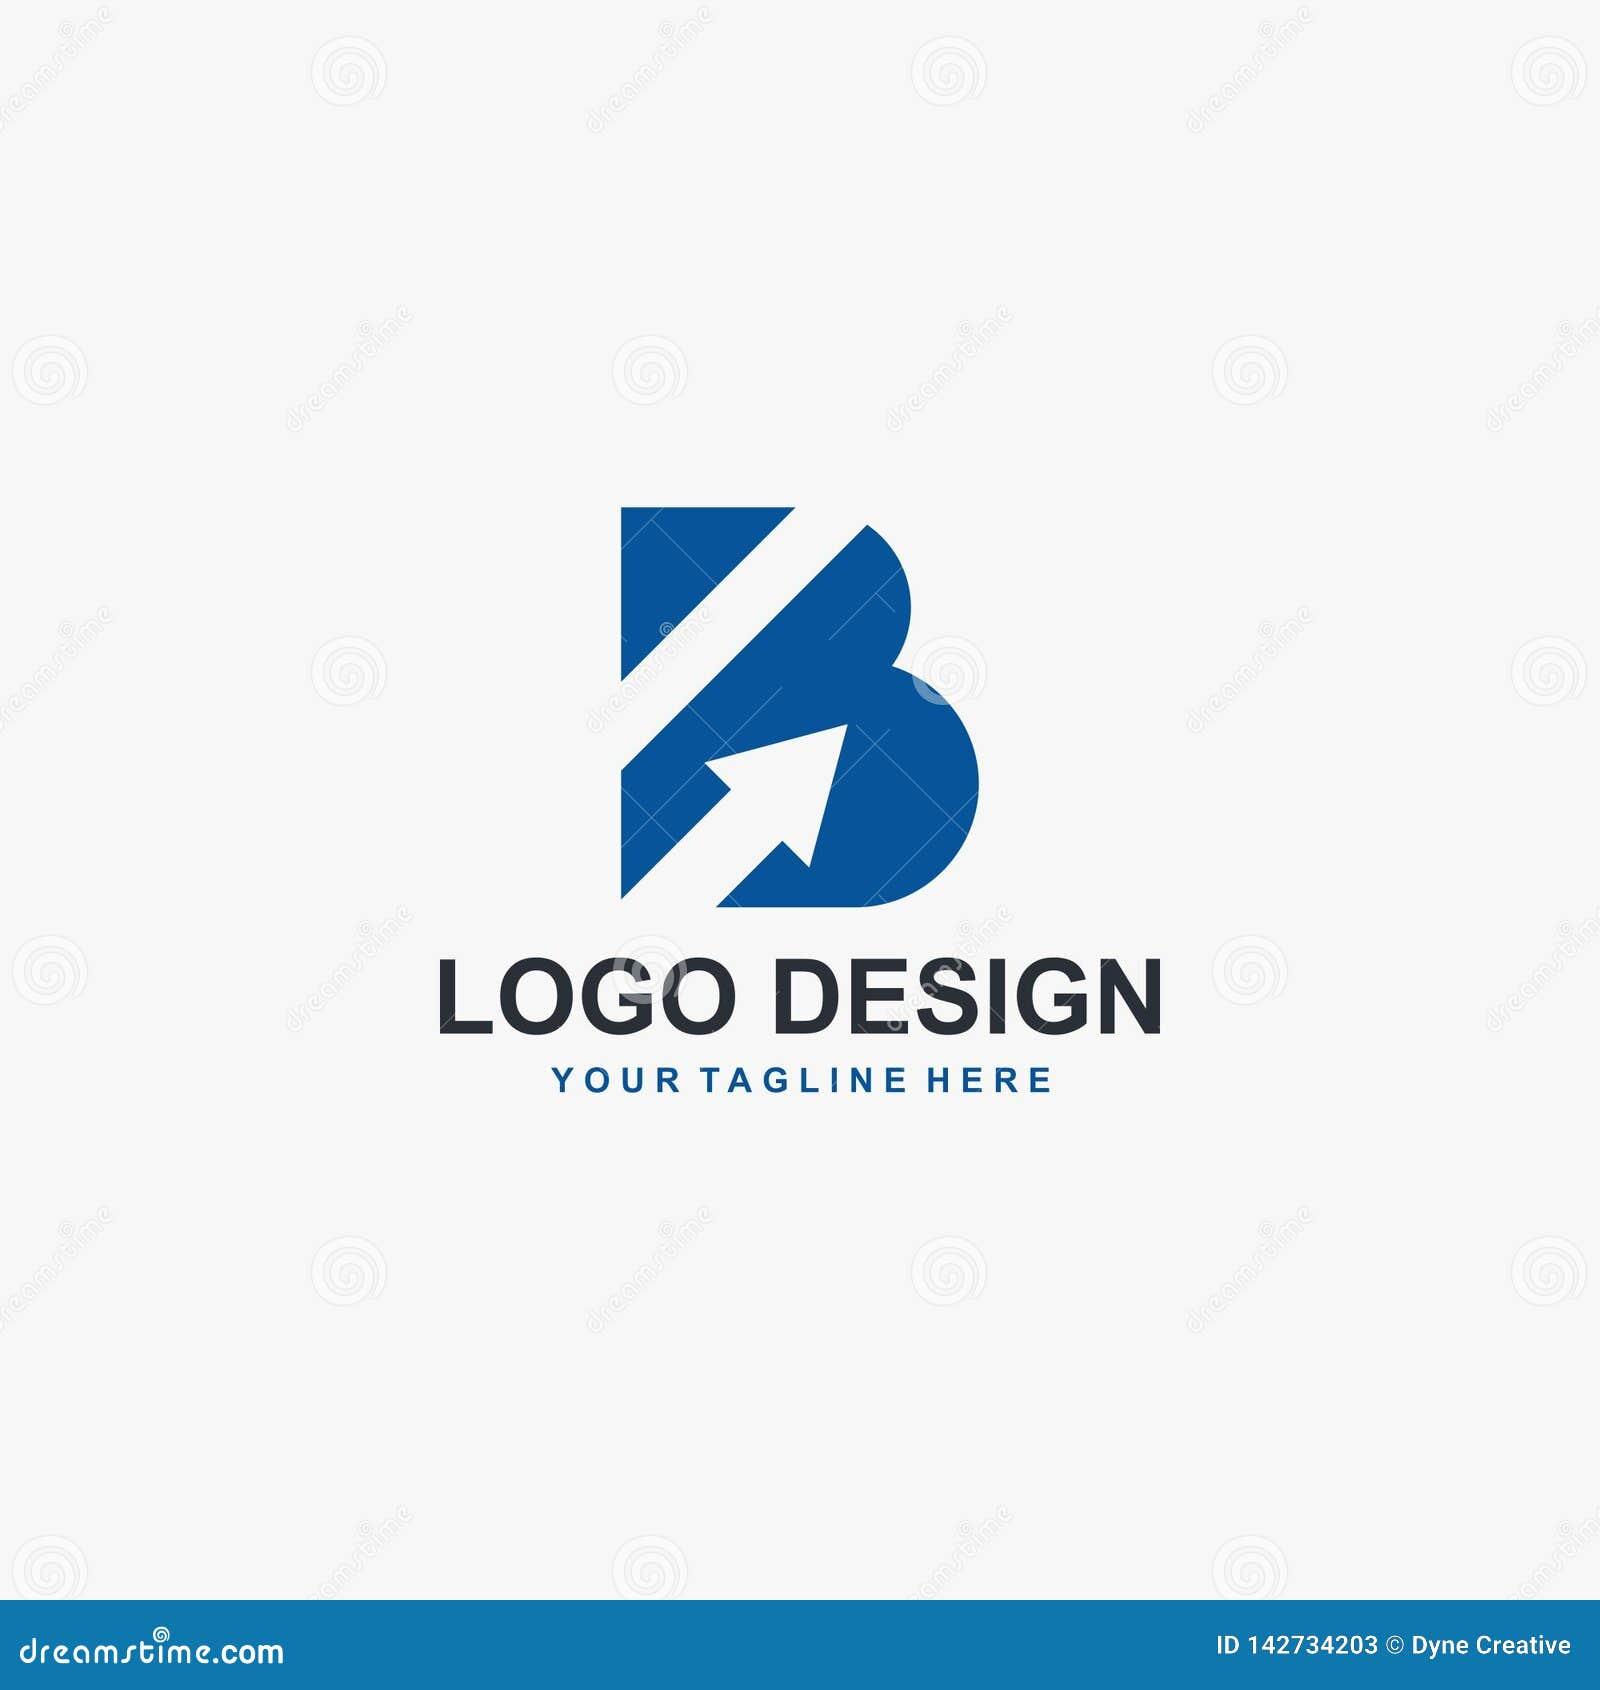 Letter B And Arrow Logo Design Vector Abstract Logo Design Type Logo For Business Stock Vector Illustration Of Alphabet Idea 142734203